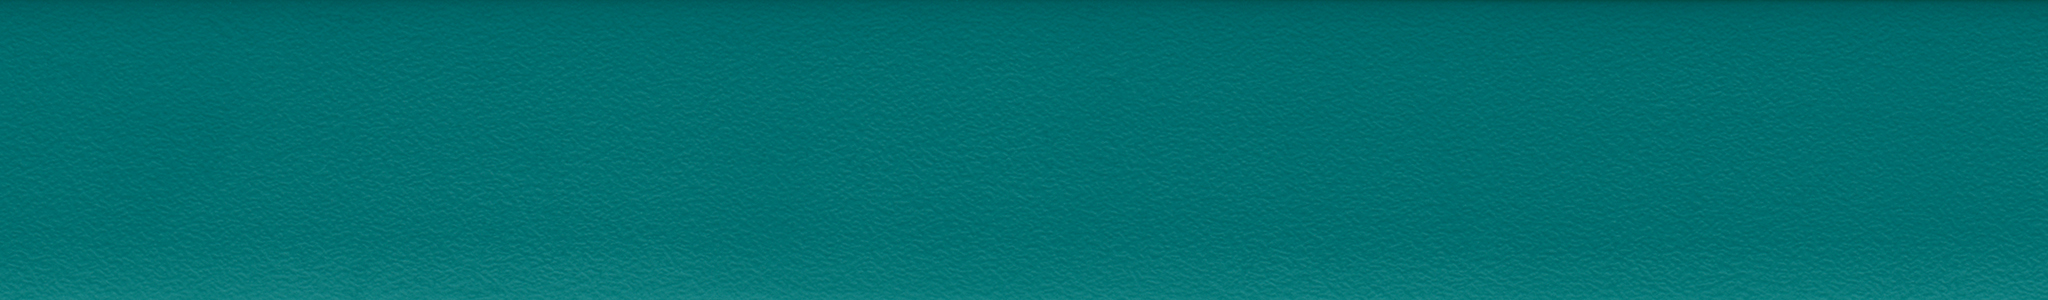 HU 160660 ABS hrana zelená perla XG